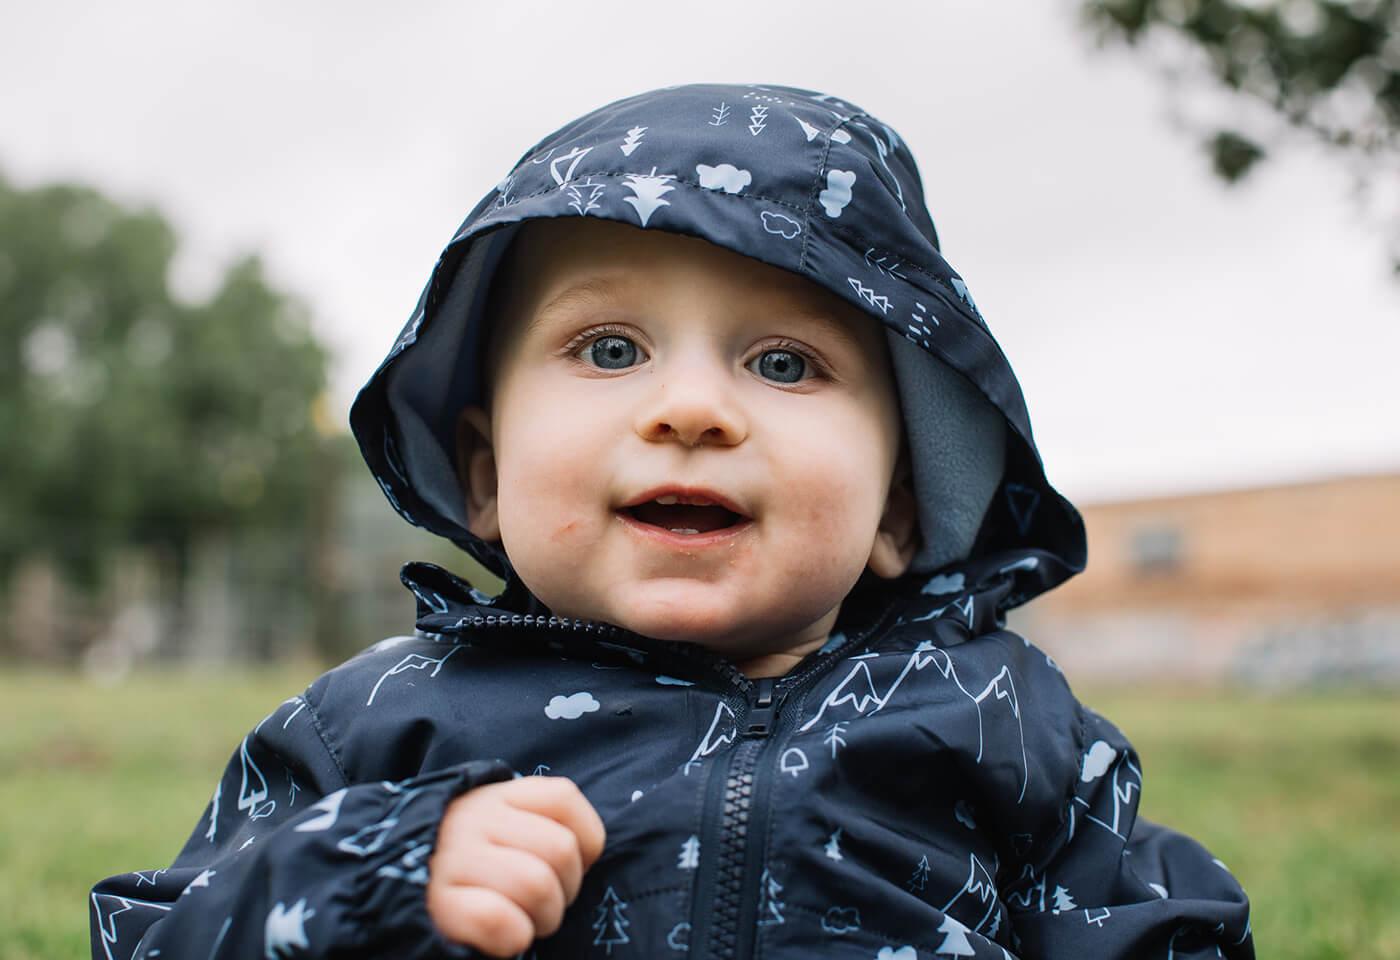 Portrait image of baby